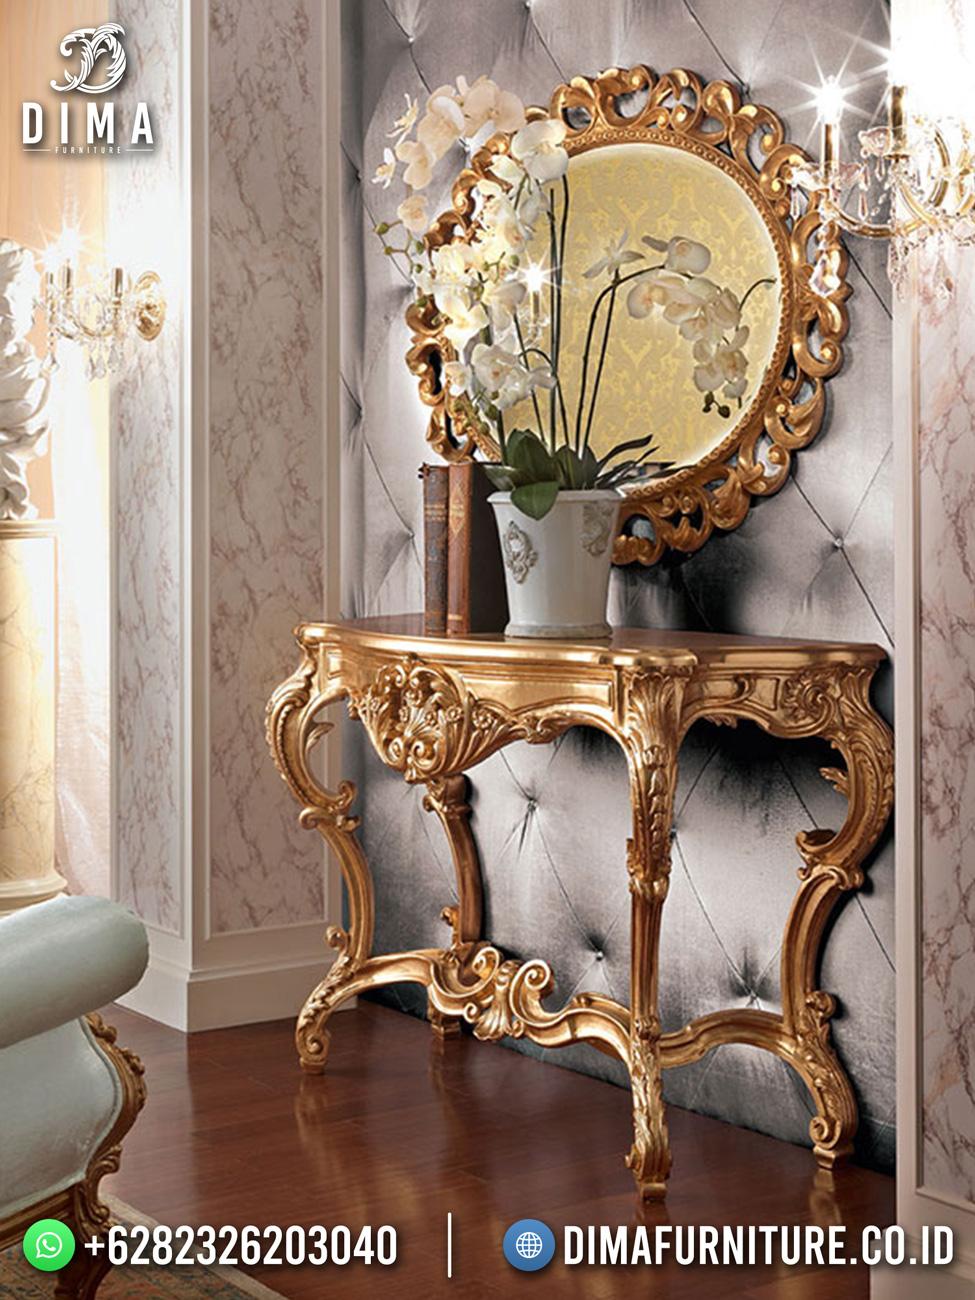 Harga Meja Hias Mewah Luxury Design Interior Inspiring TTJ-1711